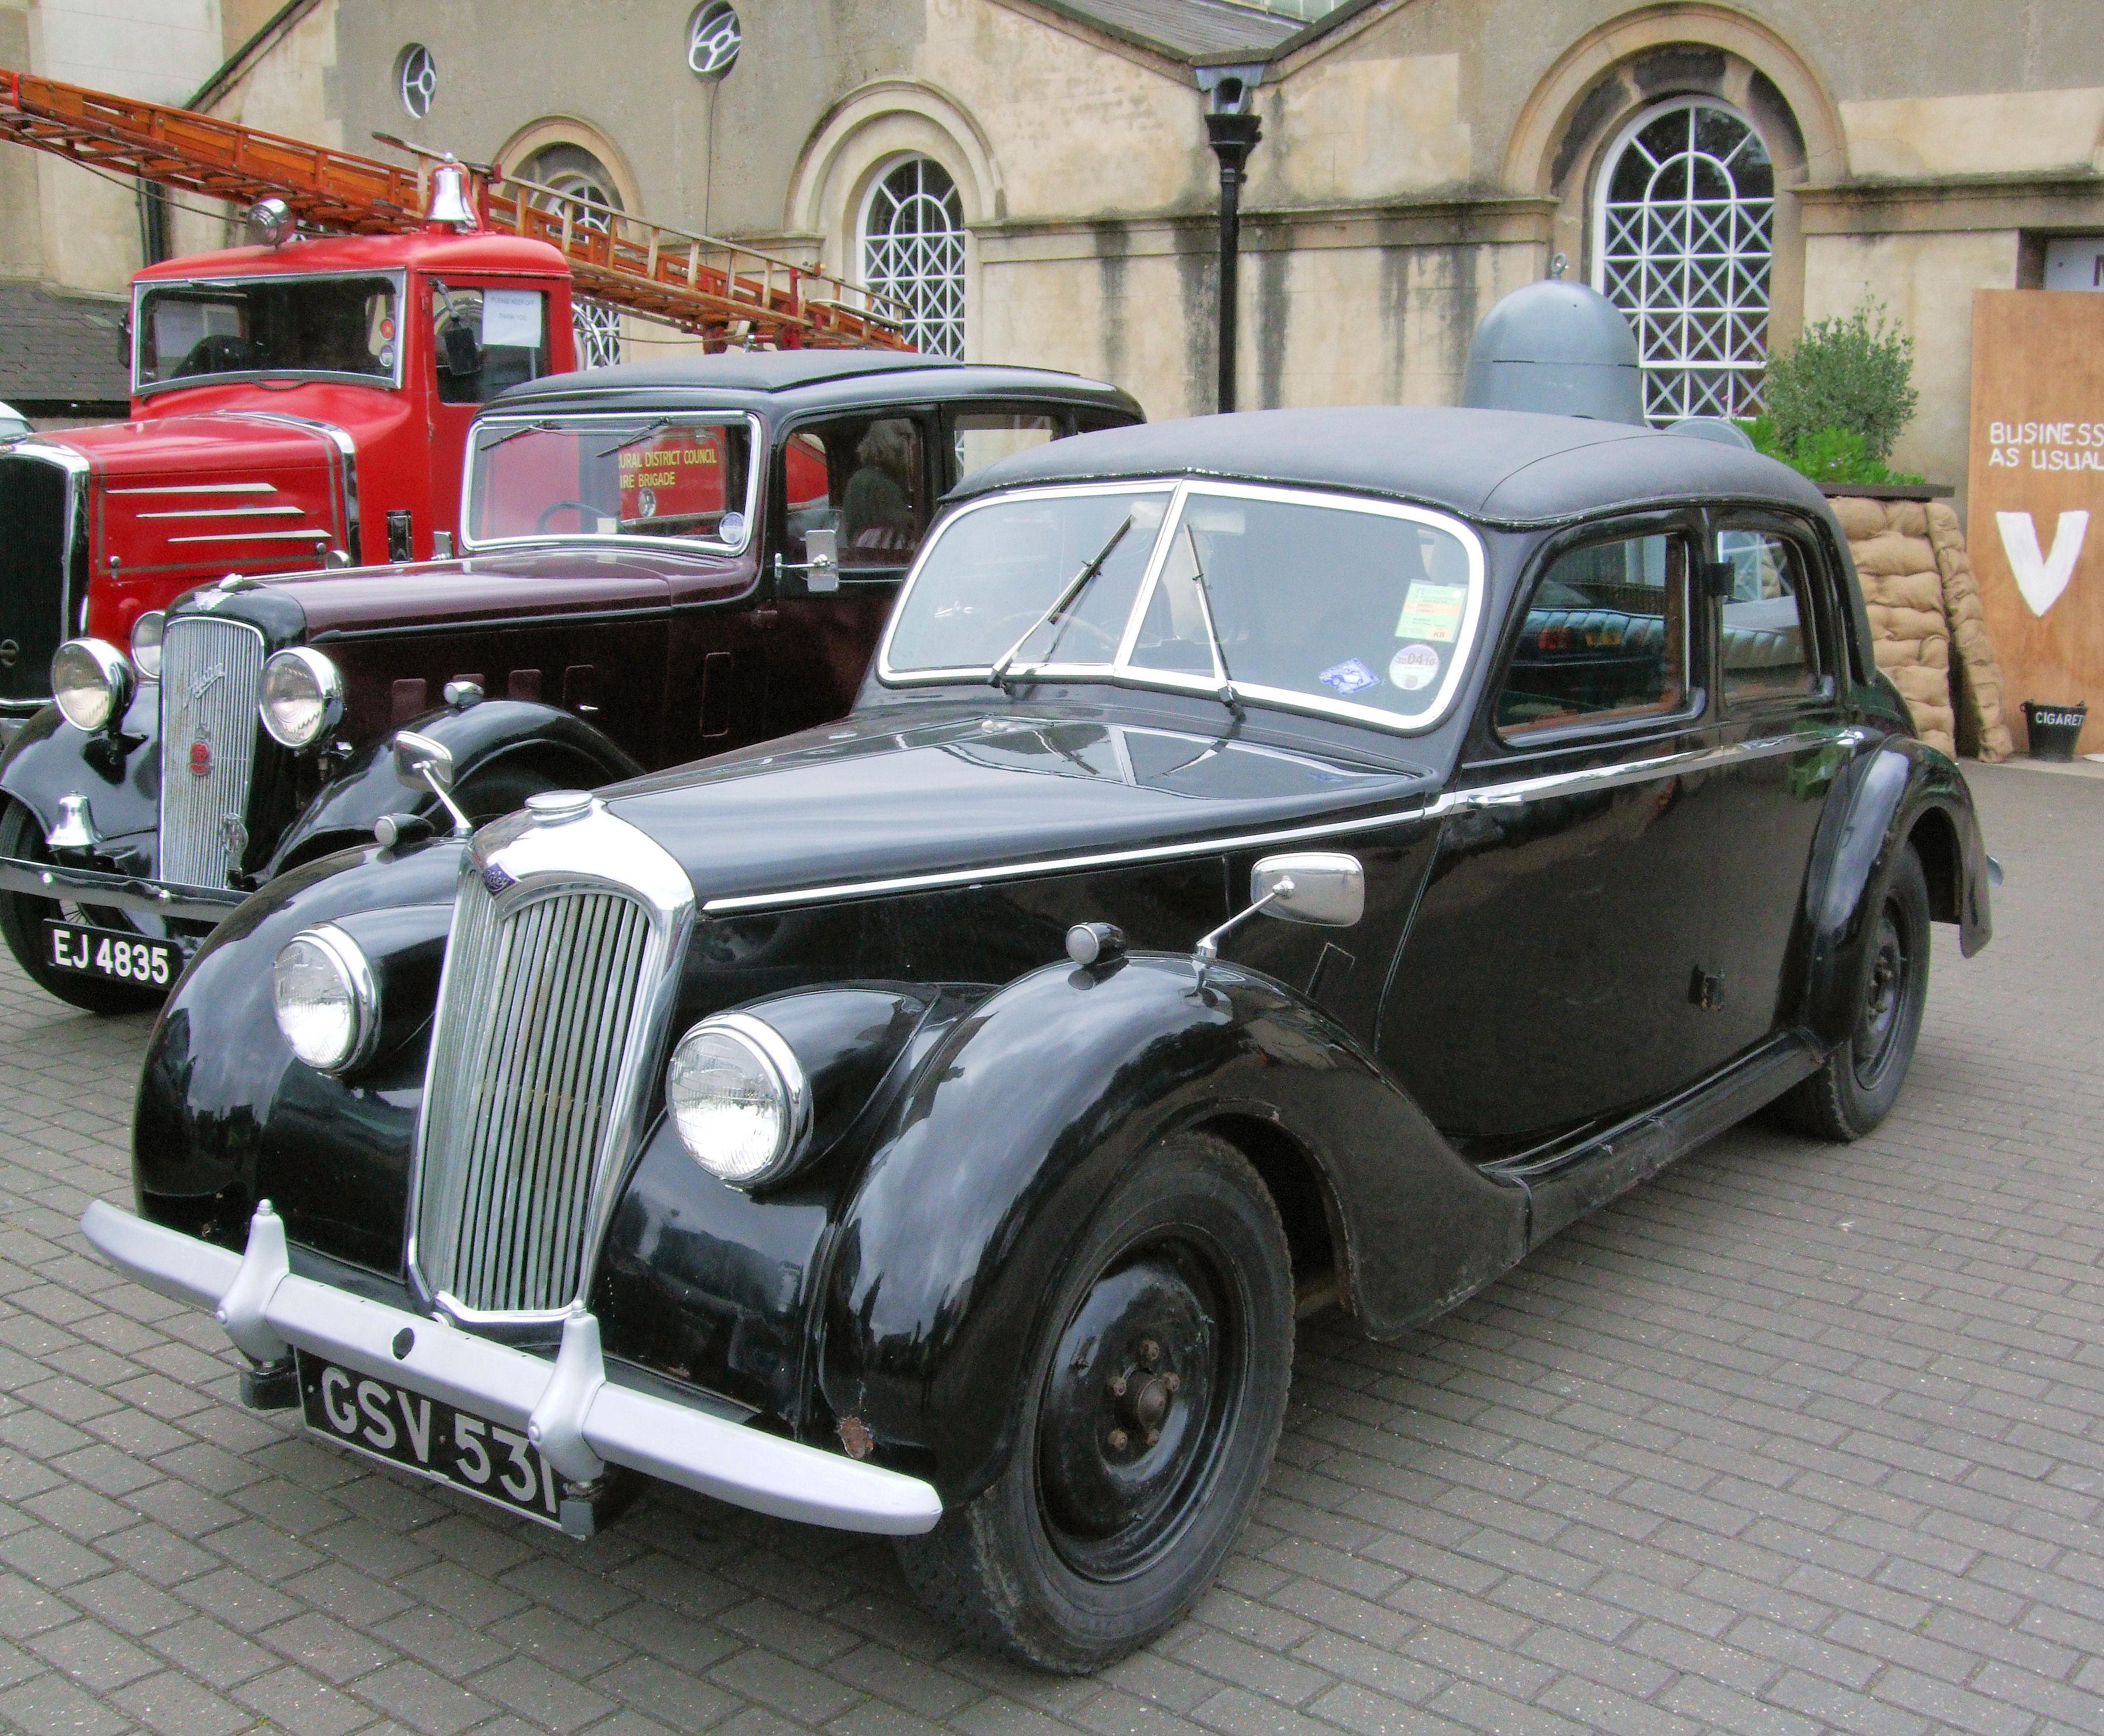 File:Vintage Riley Car, Kew Bridge Steam Museum.jpg - Wikimedia ...